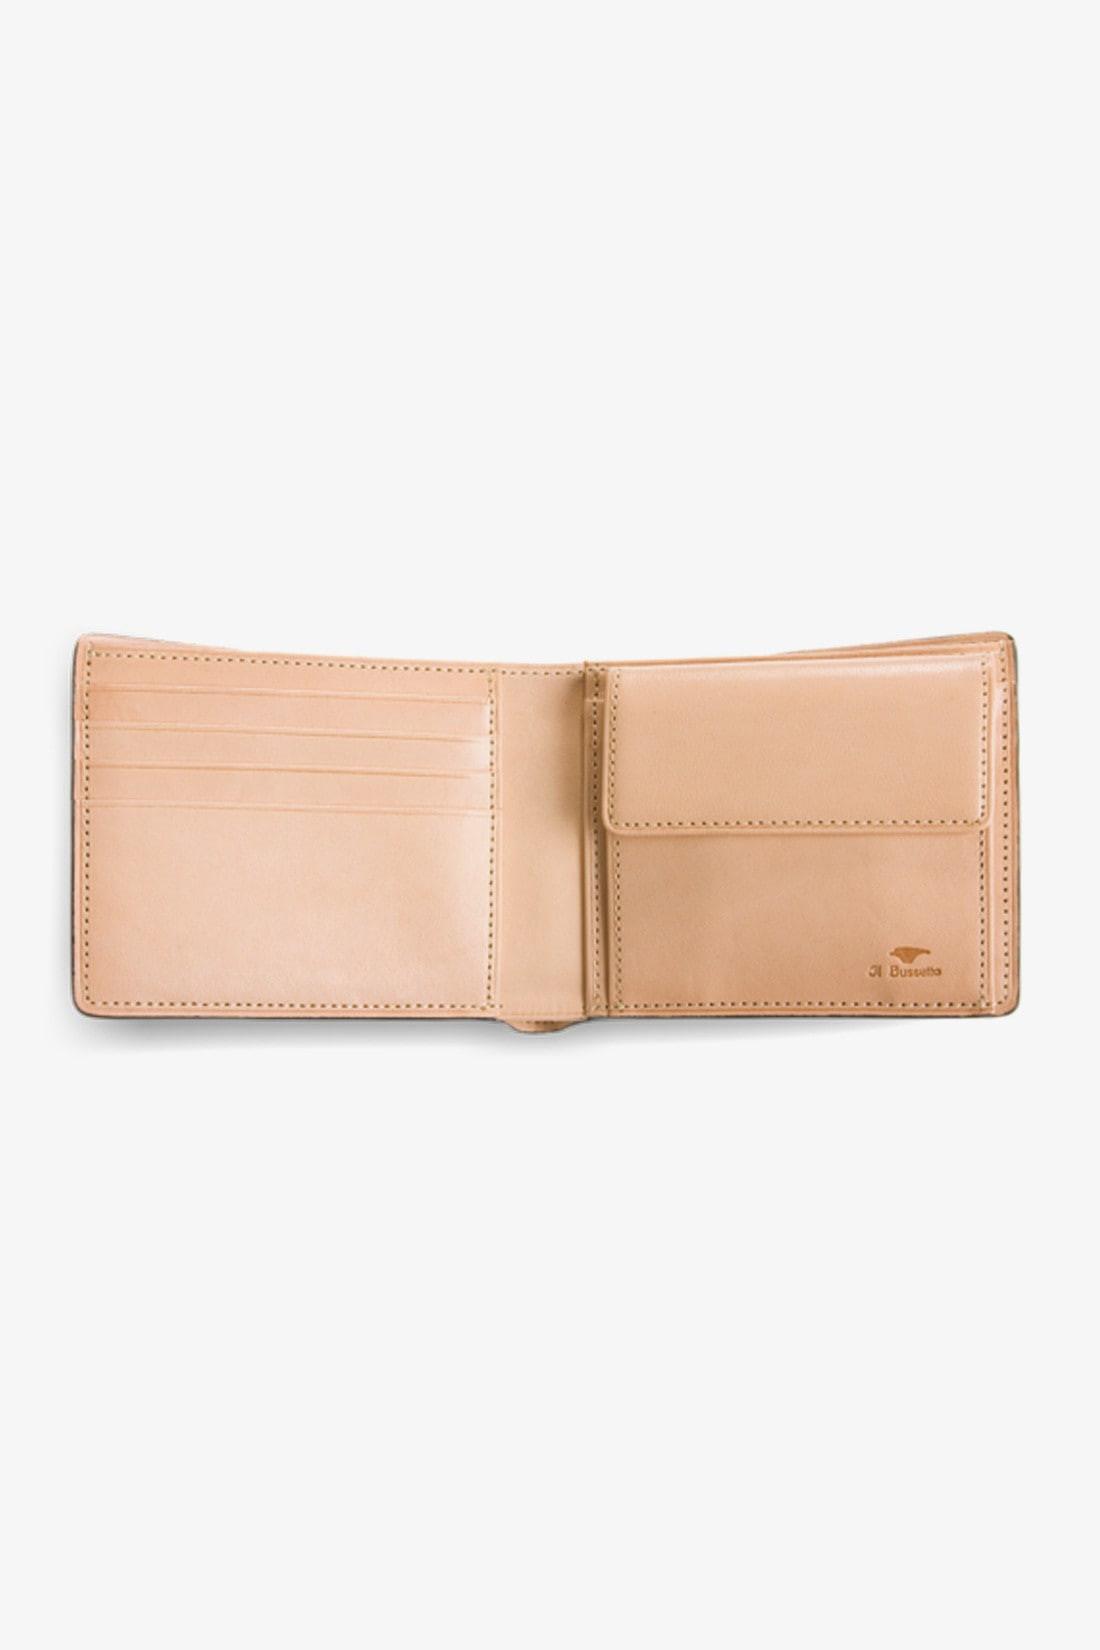 IL BUSSETTO / Bi-fold wallet w/ coin pocket Poseidon blue